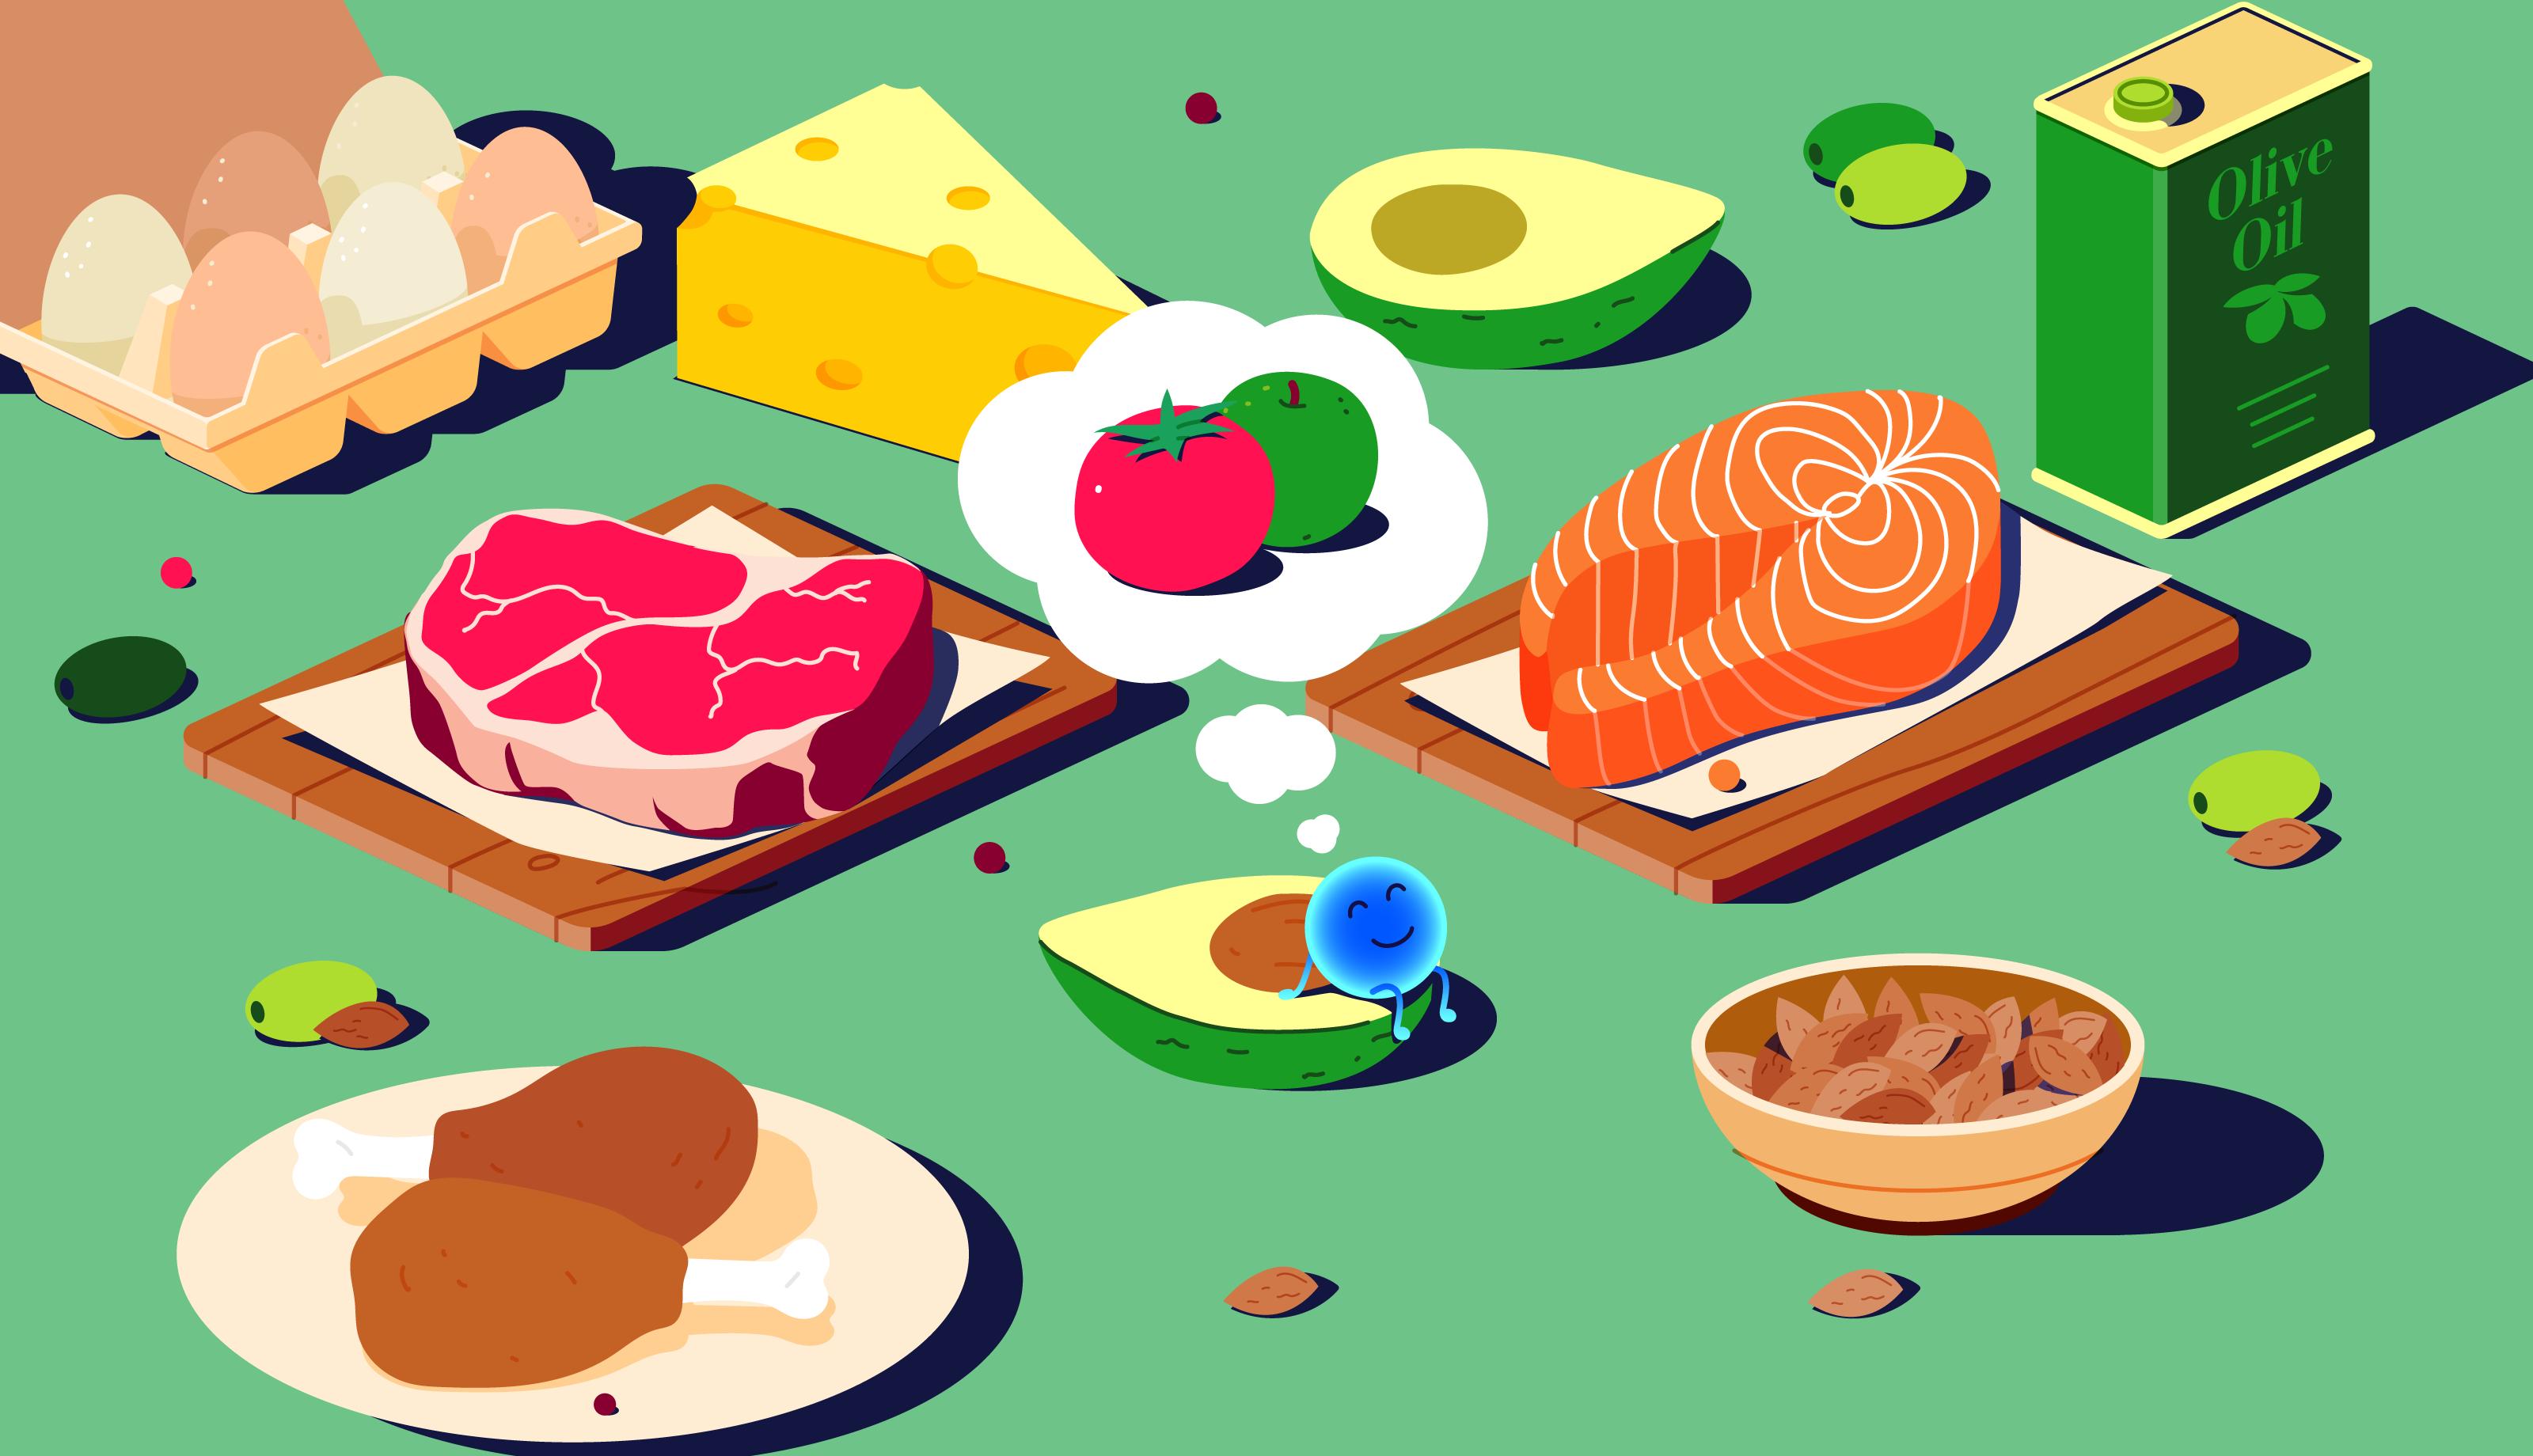 Pin by Bordan Maria on Sănătate | Diete, Planuri dietă, Smoothies sănătoase